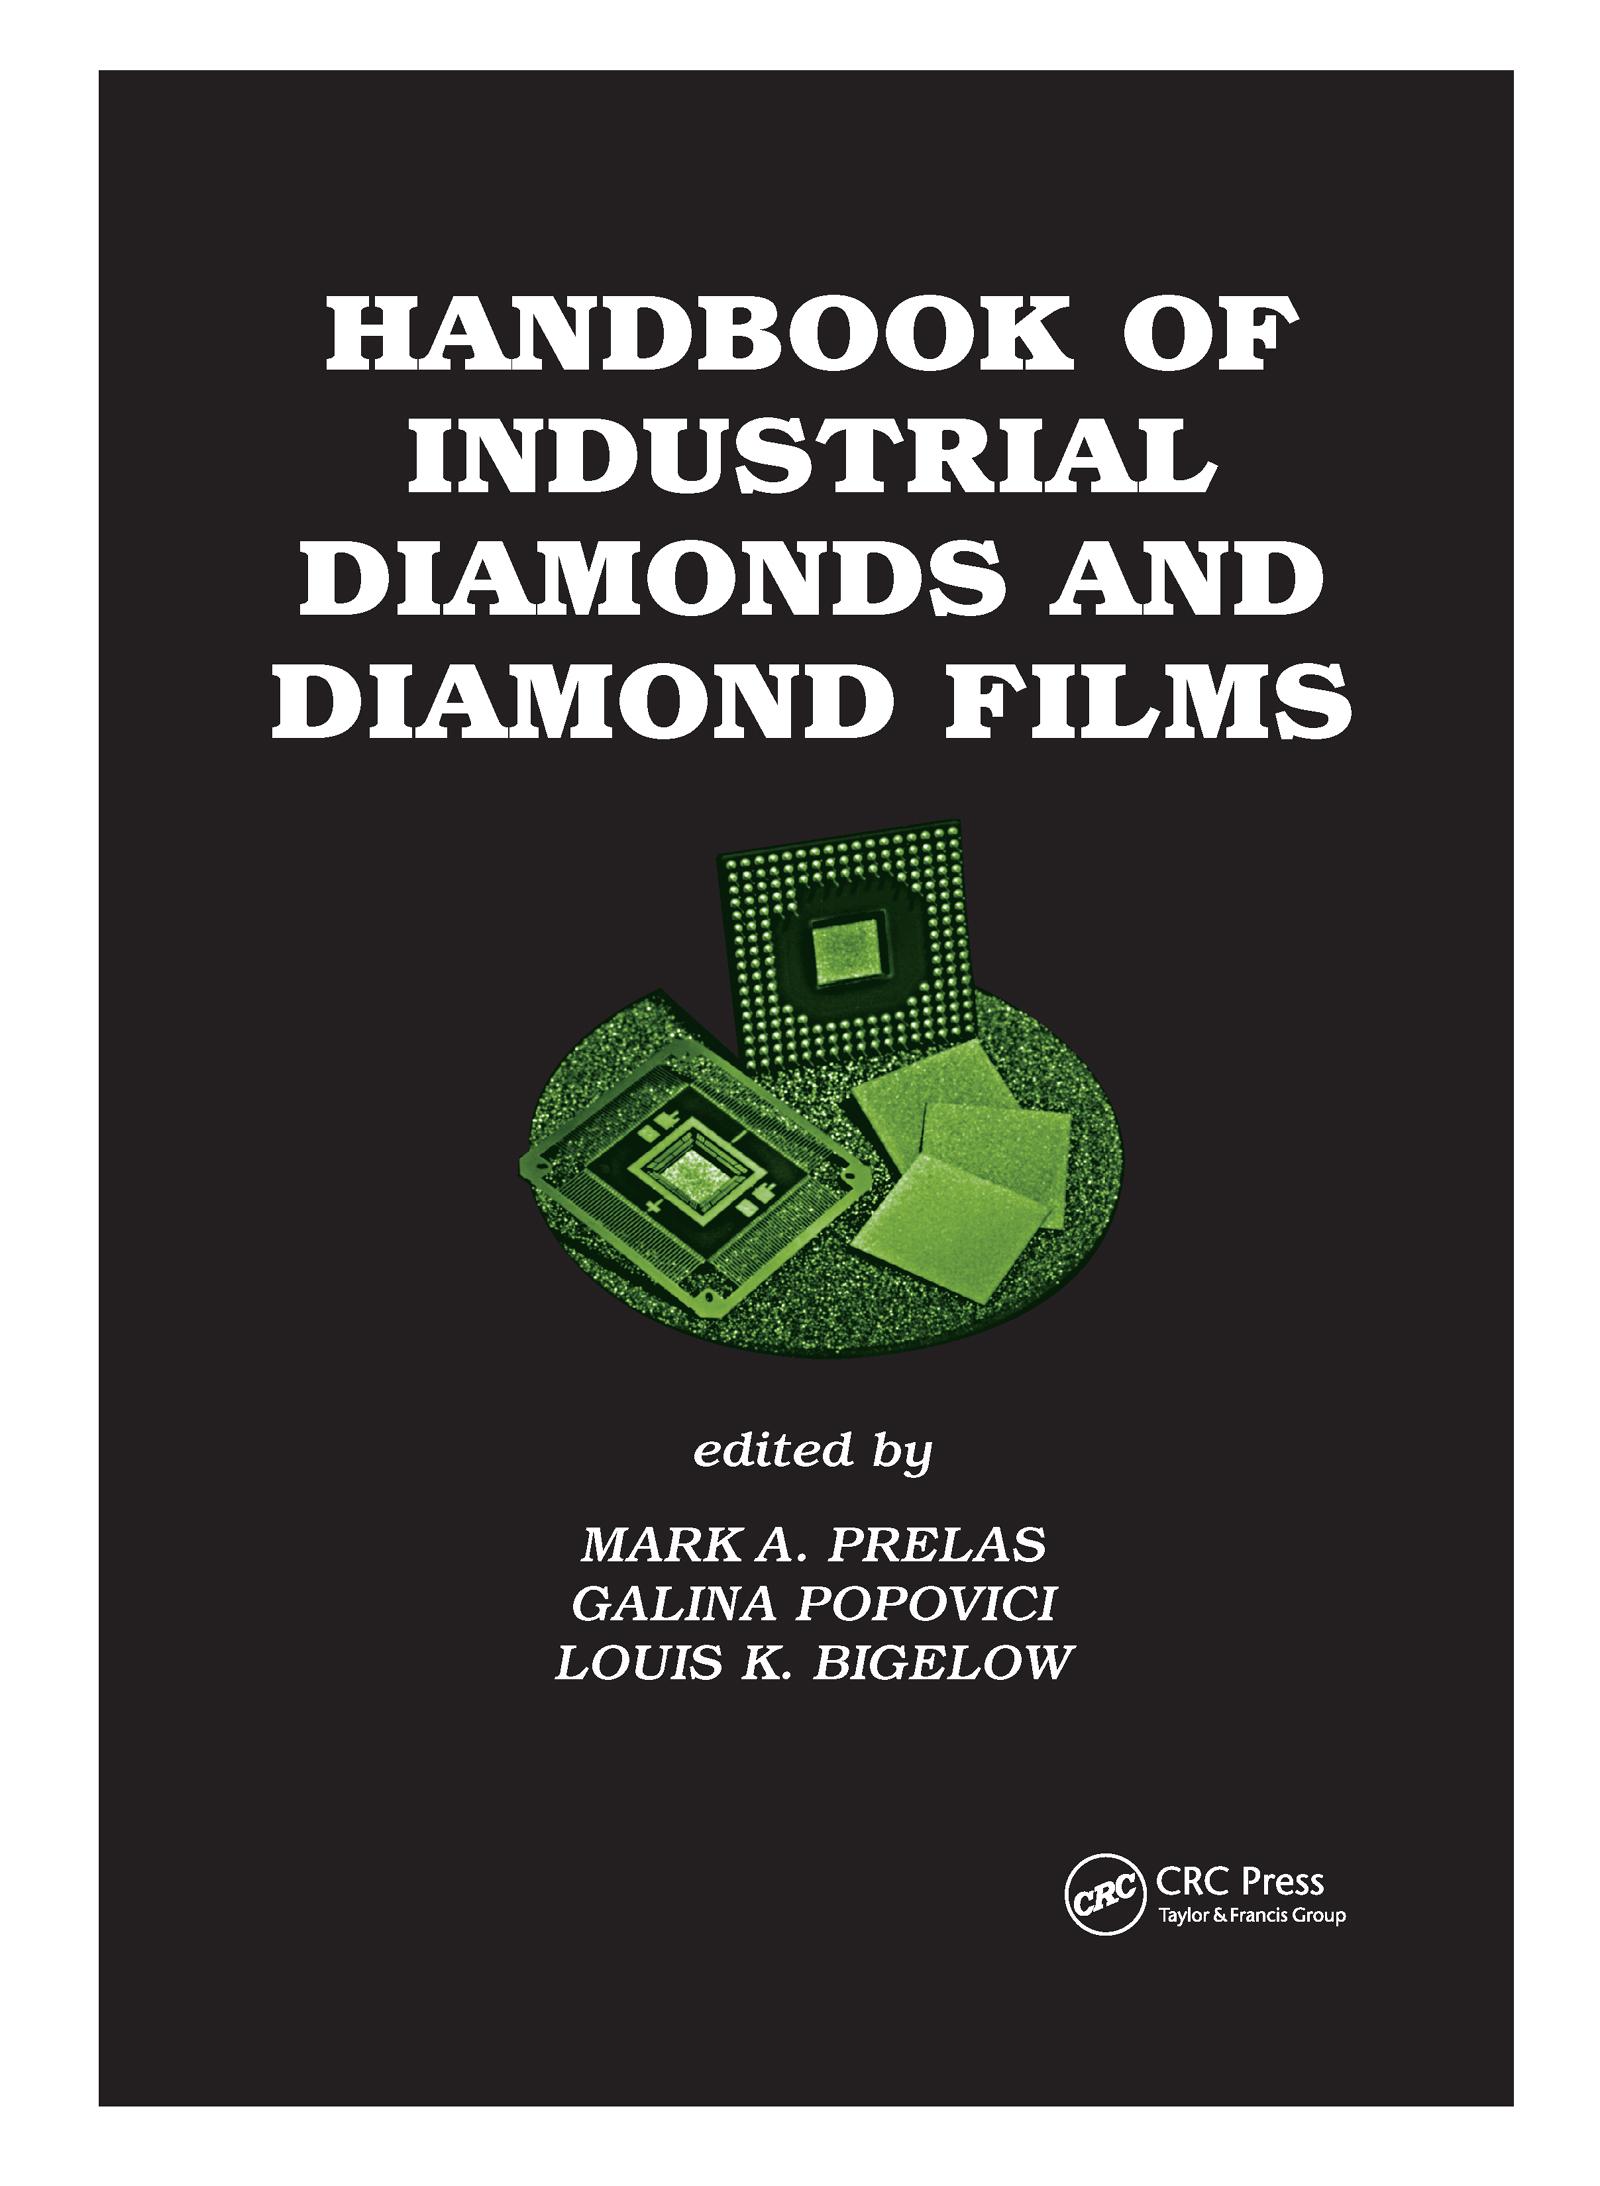 Handbook of Industrial Diamonds and Diamond Films